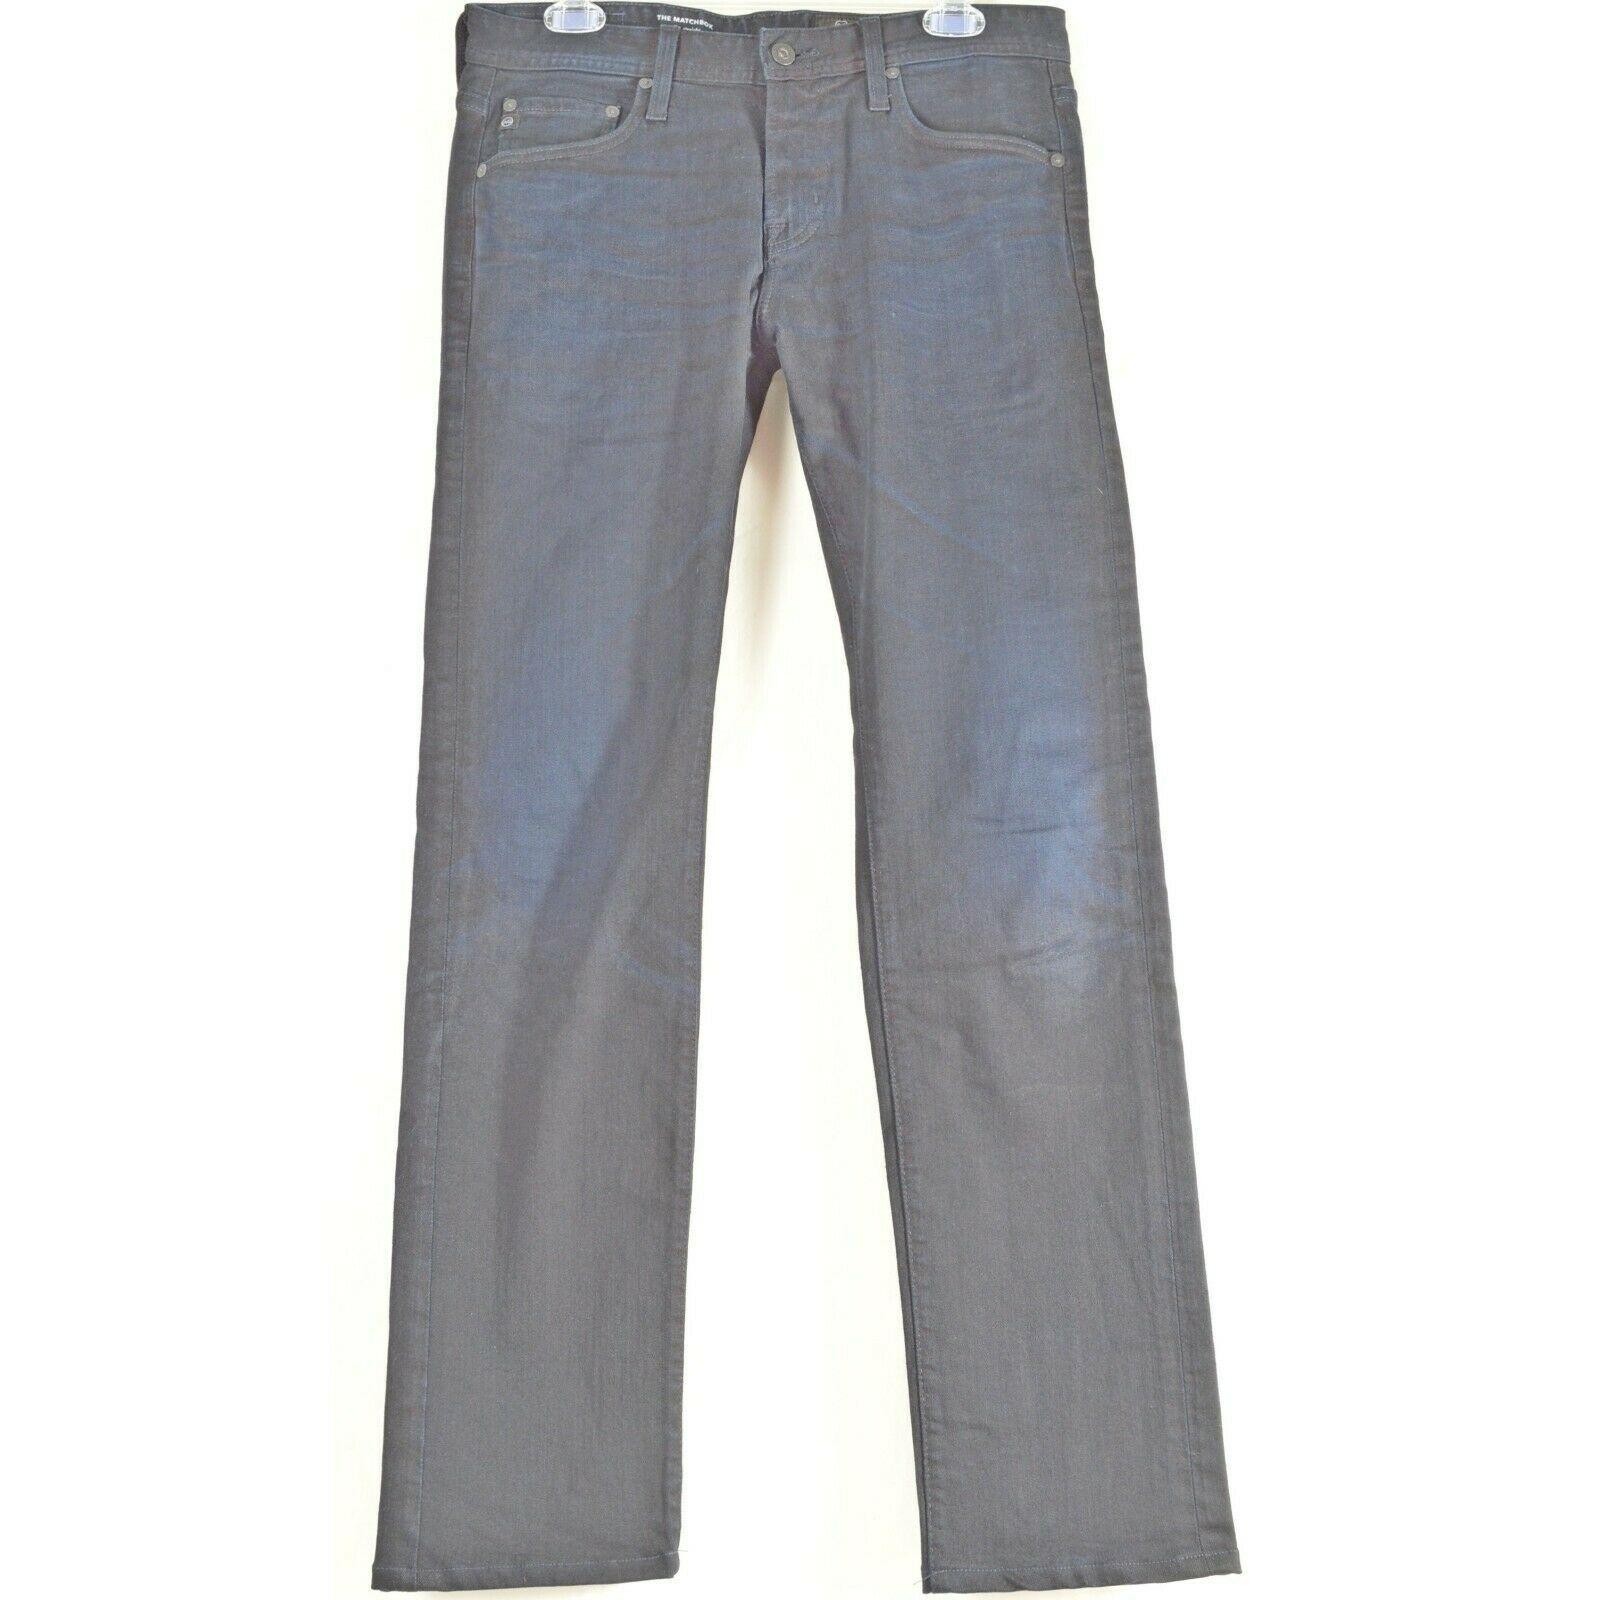 AG Adriano Goldschmied jeans 30 x 34 men Matchbox dark Slim Straight tall unique image 11